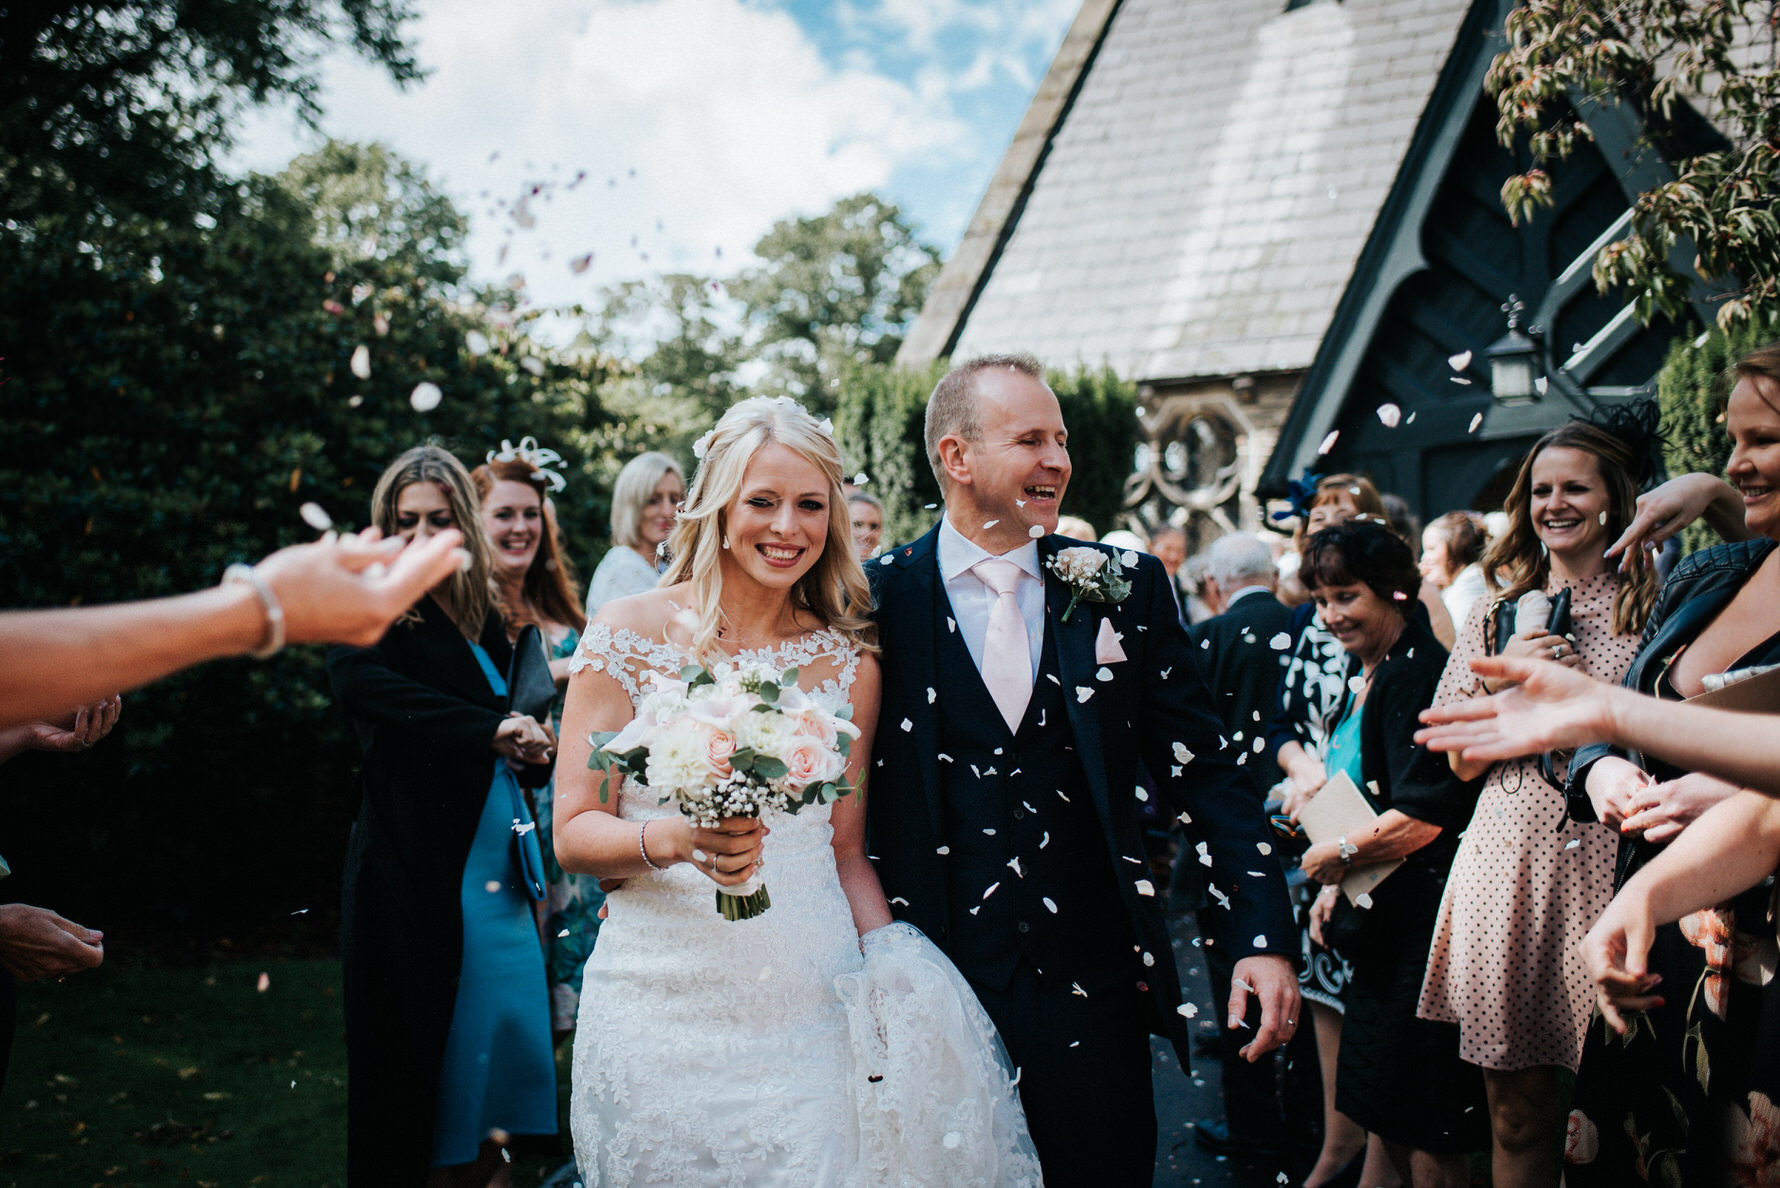 Cheshire Wedding Photography - Confetti in Dunham Massey